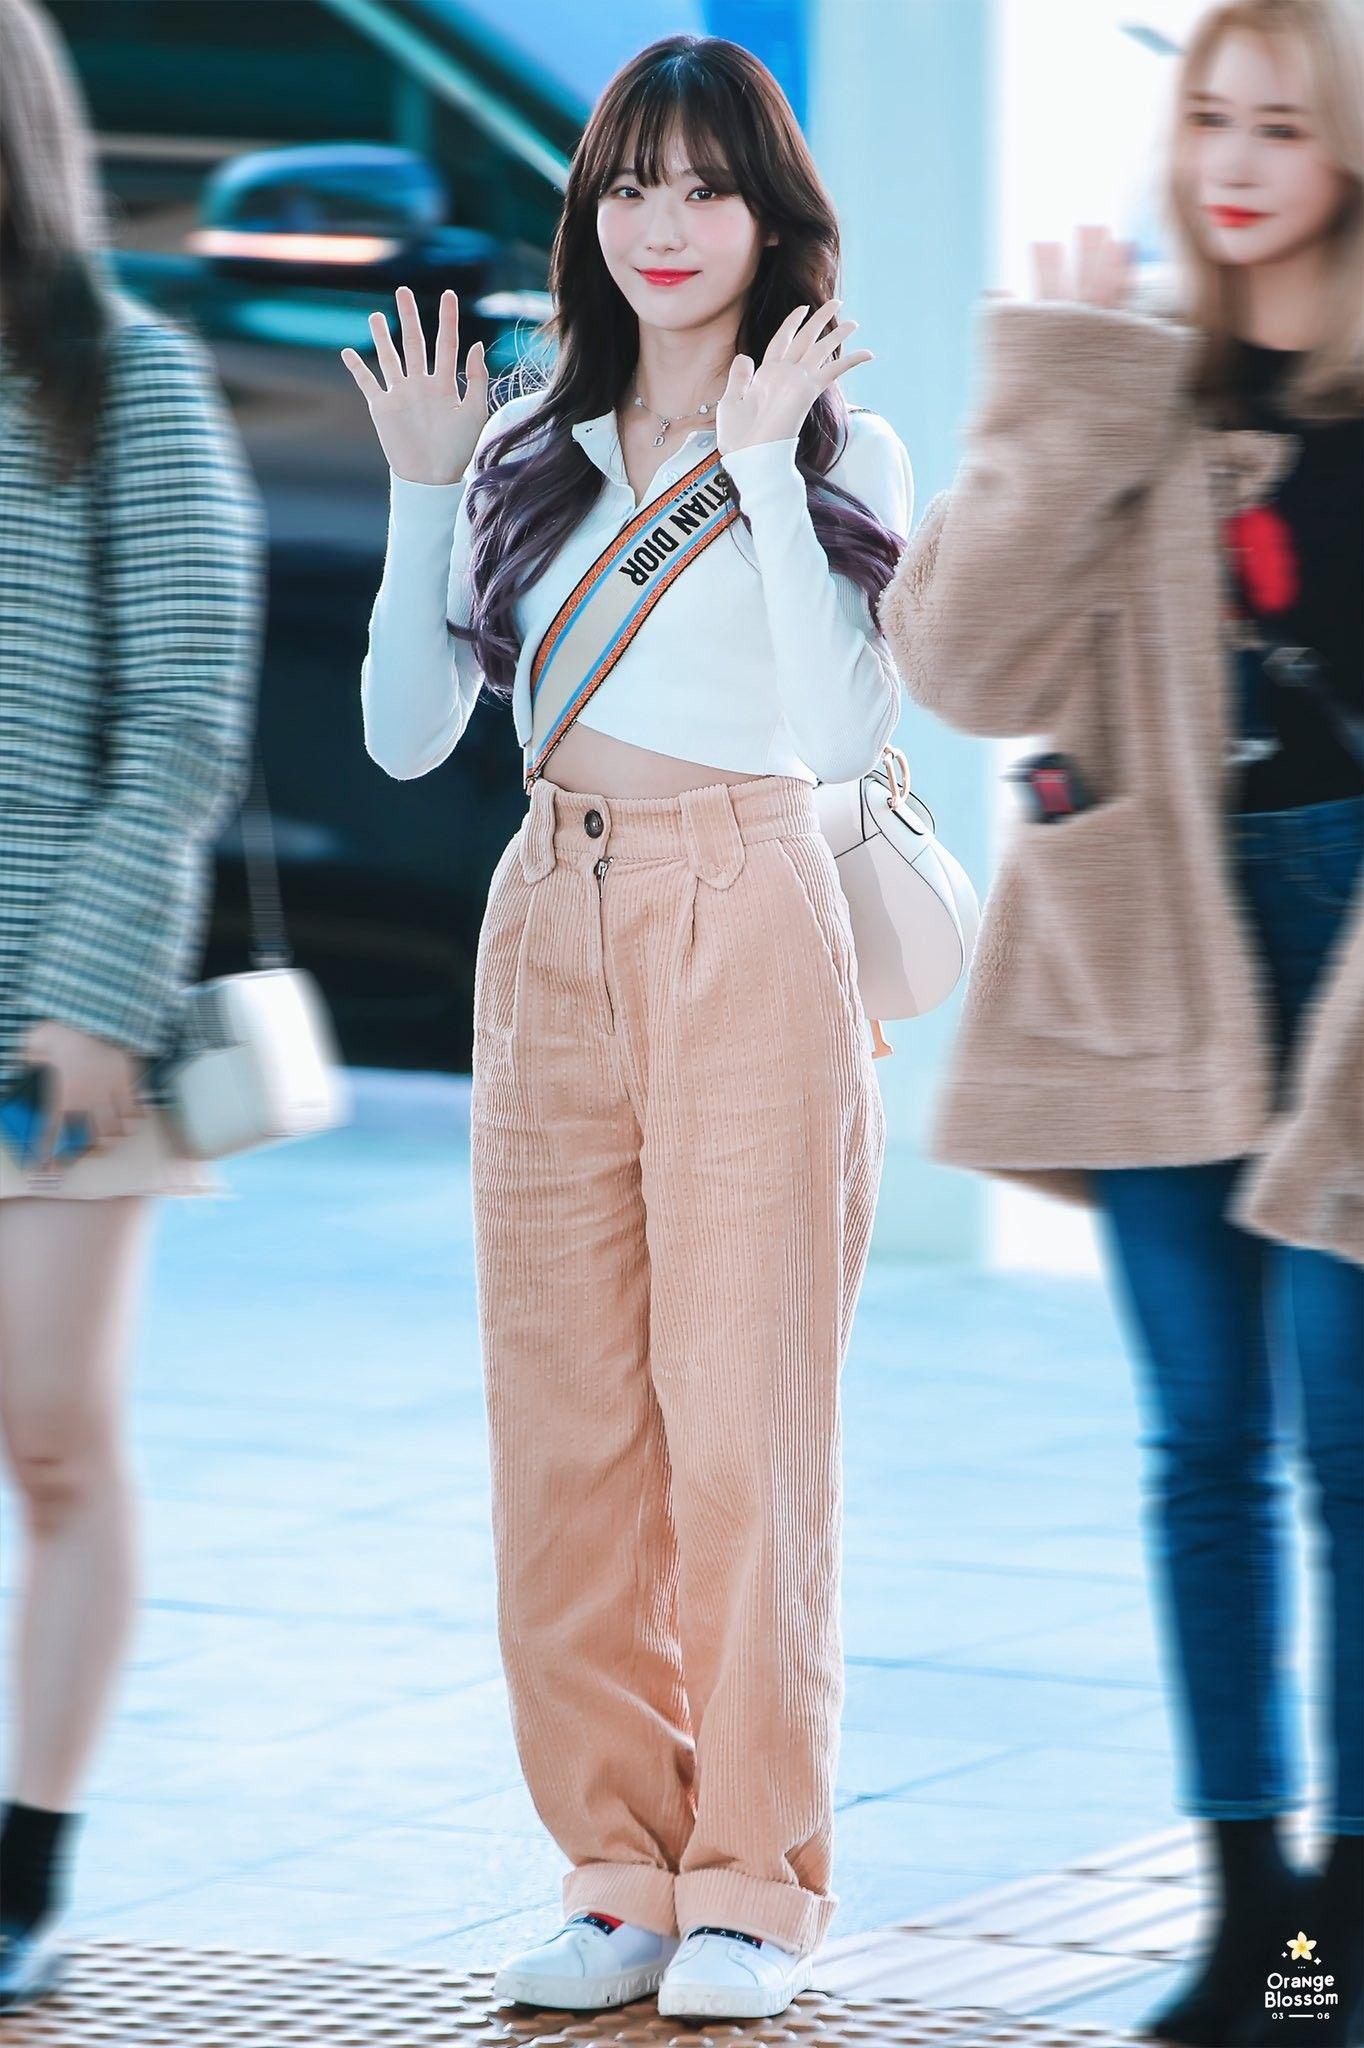 Wjsn Luda 191109 Incheon Airport To Singapore Airport Fashion Kpop Kpop Fashion Kpop Outfits